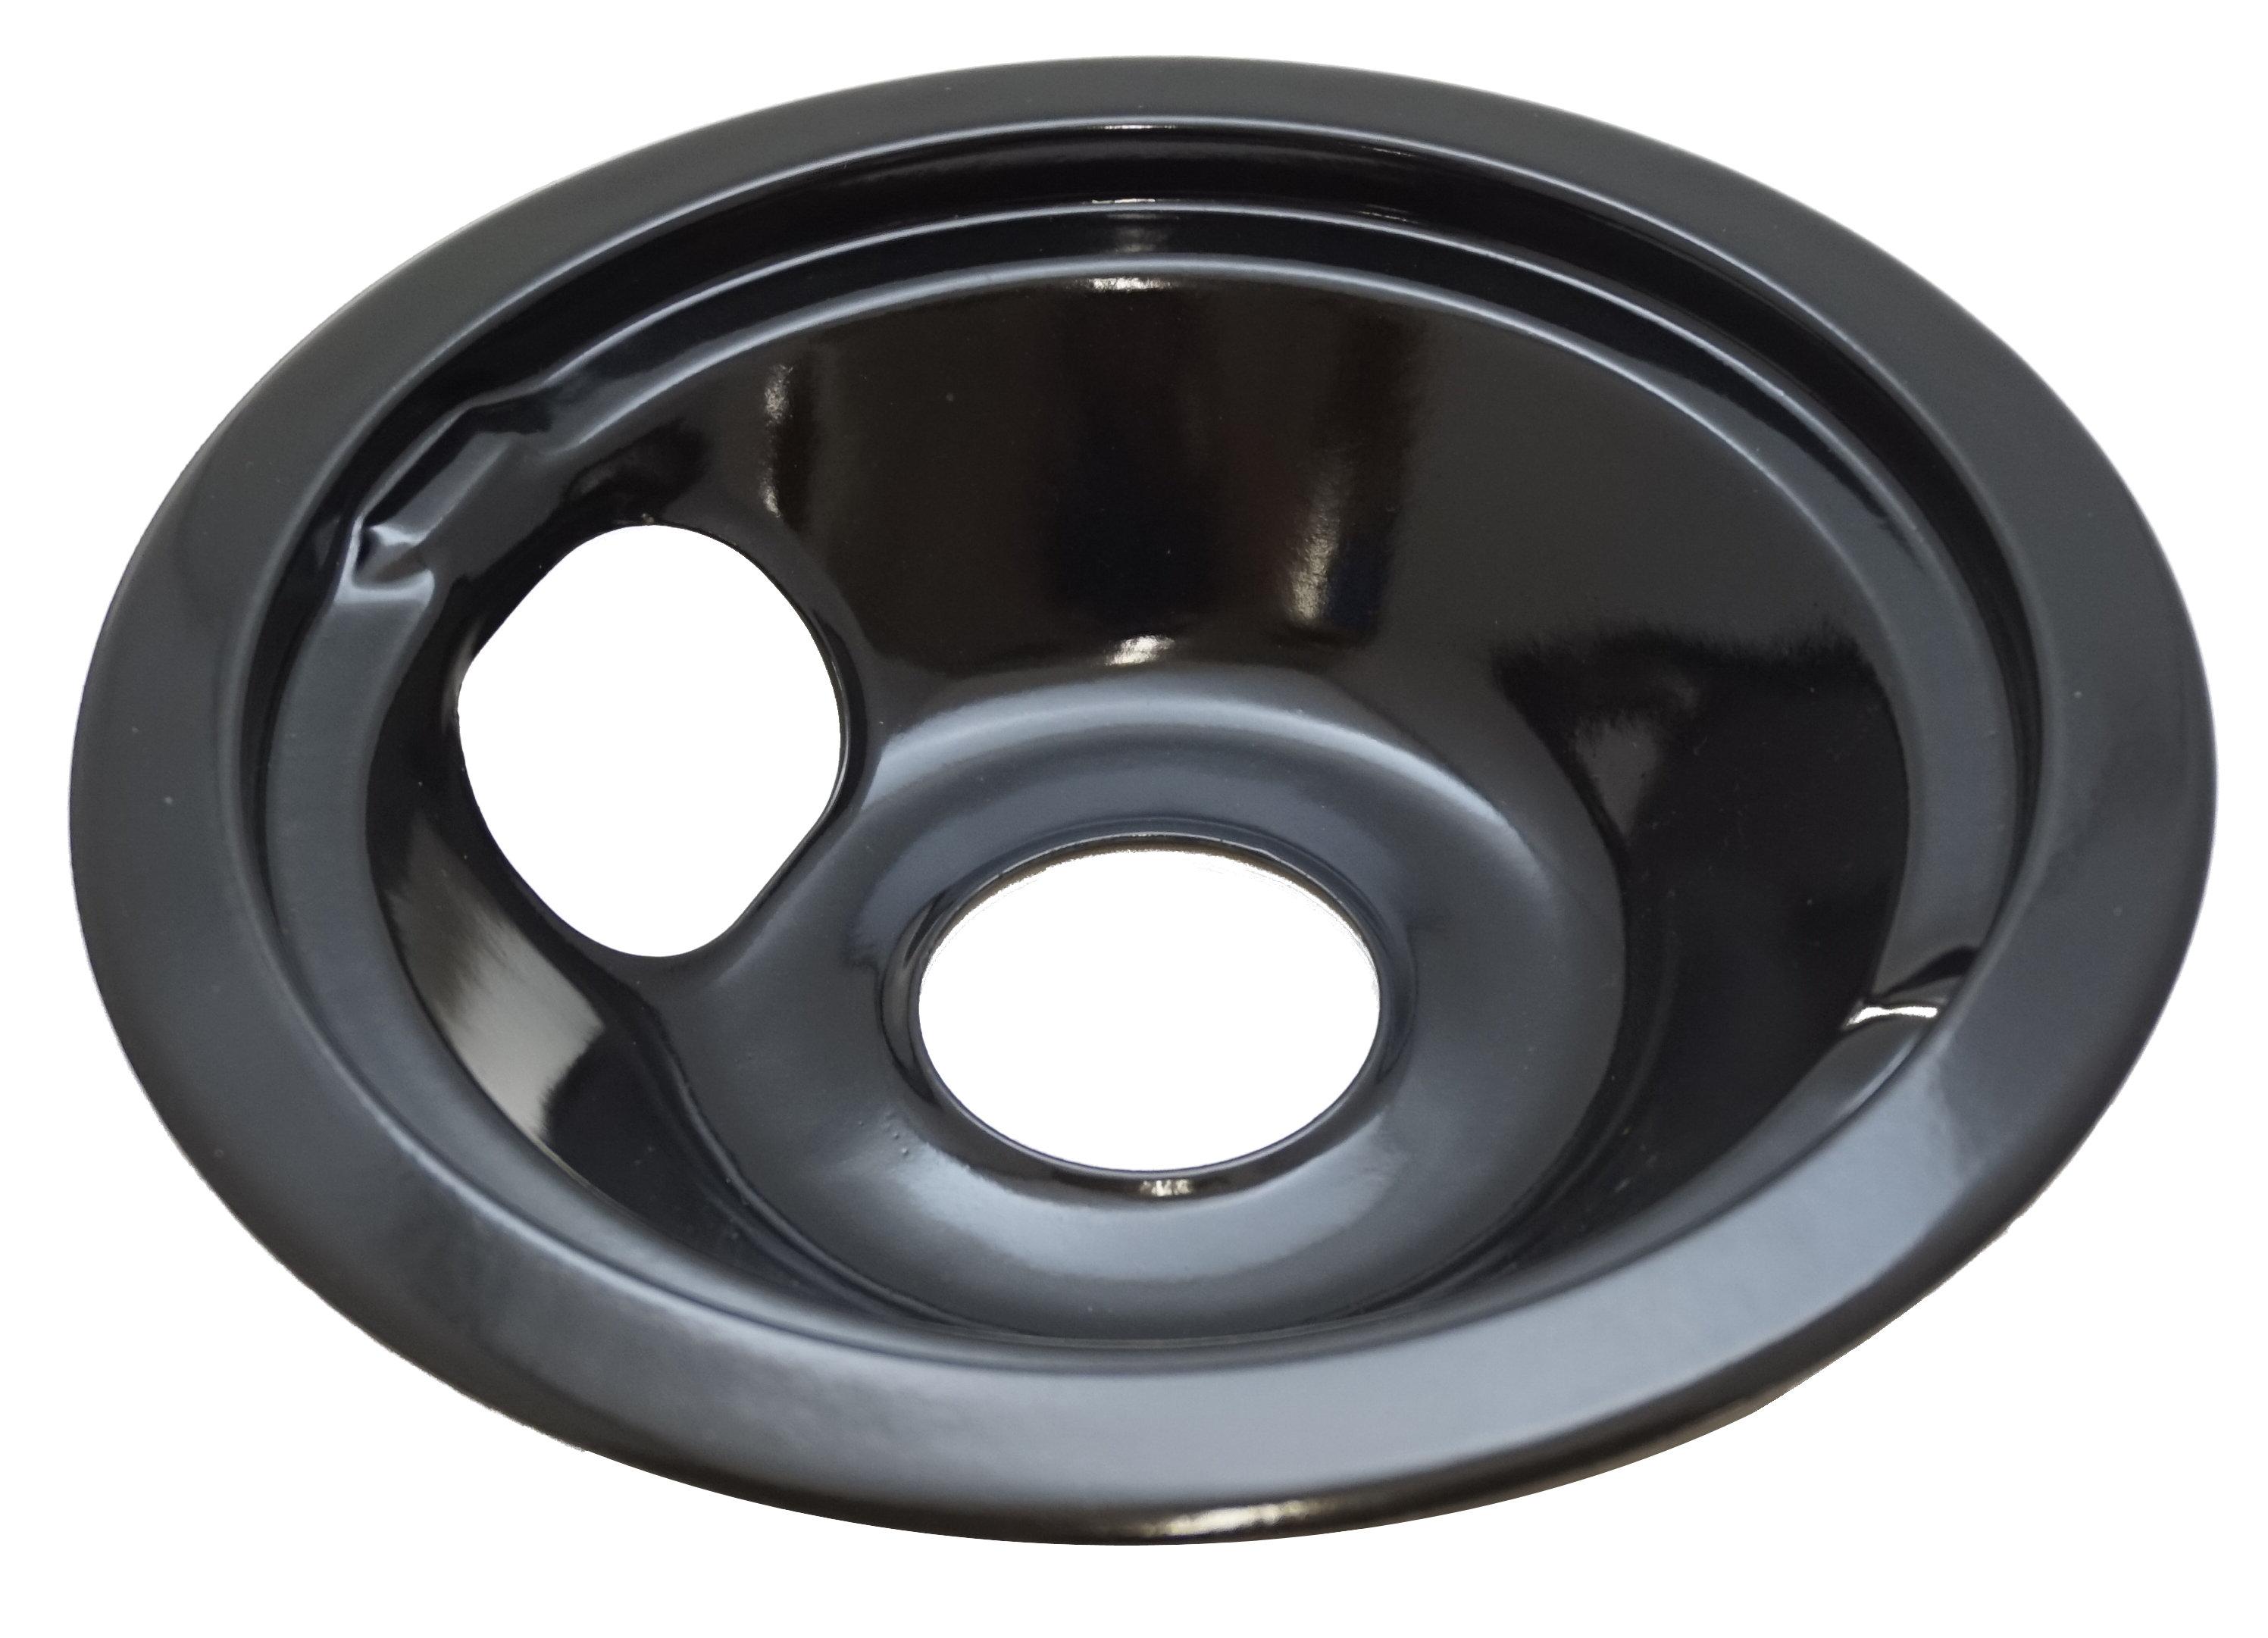 "Electric Stove Range Cooktop 6/"" Black Burner Drip Pan Bowl WB31K5043 WB32X5104"